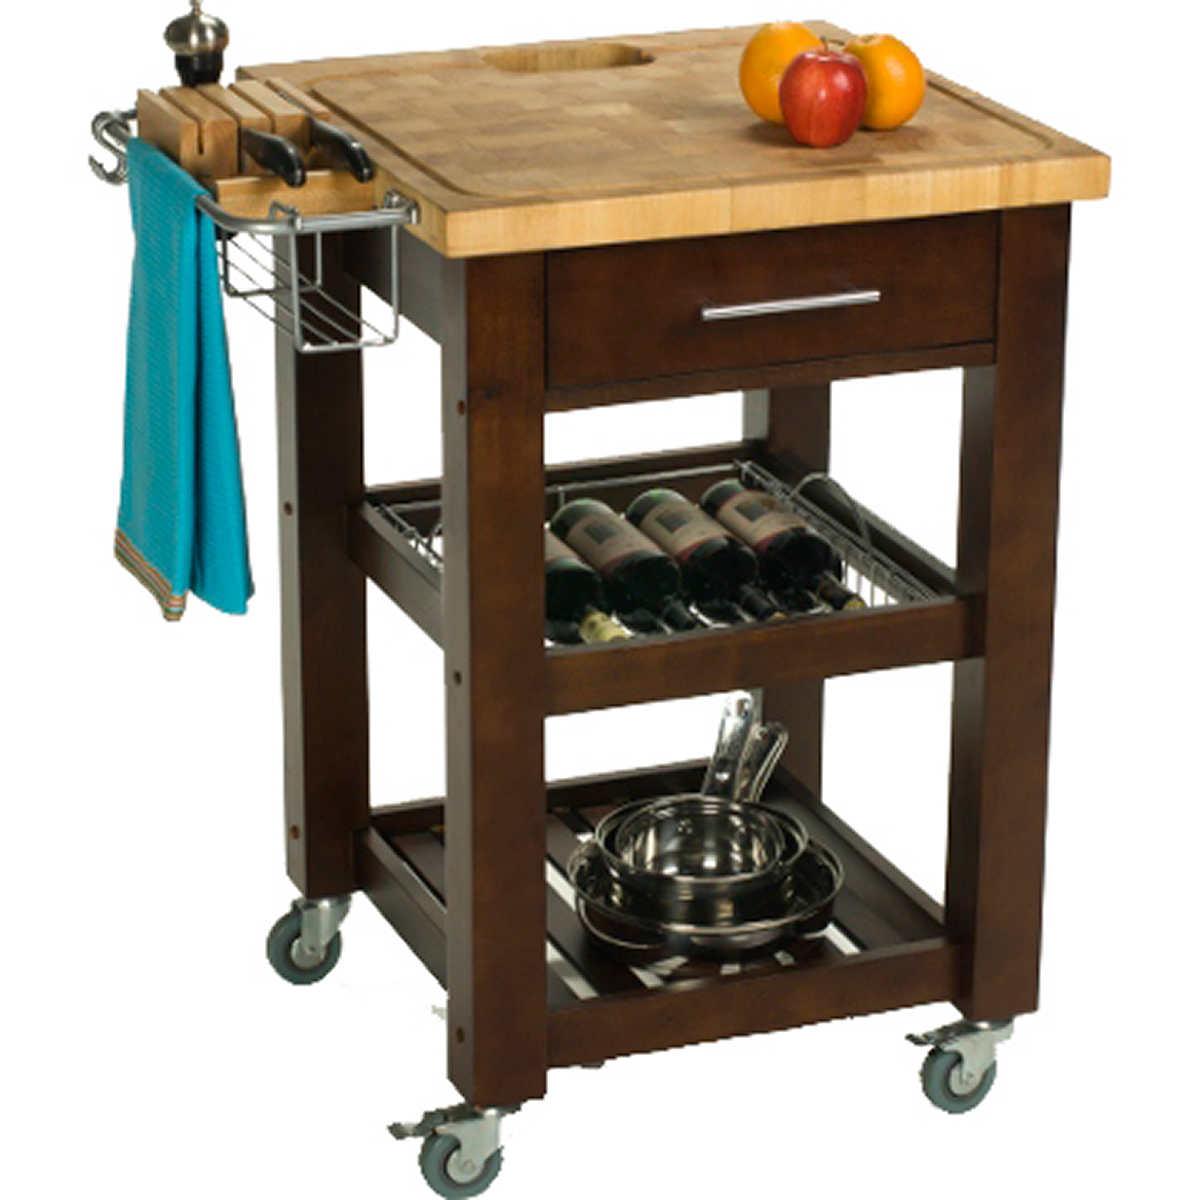 "chris & chris 24"" x 24"" x 35"" pro chef kitchen work station"